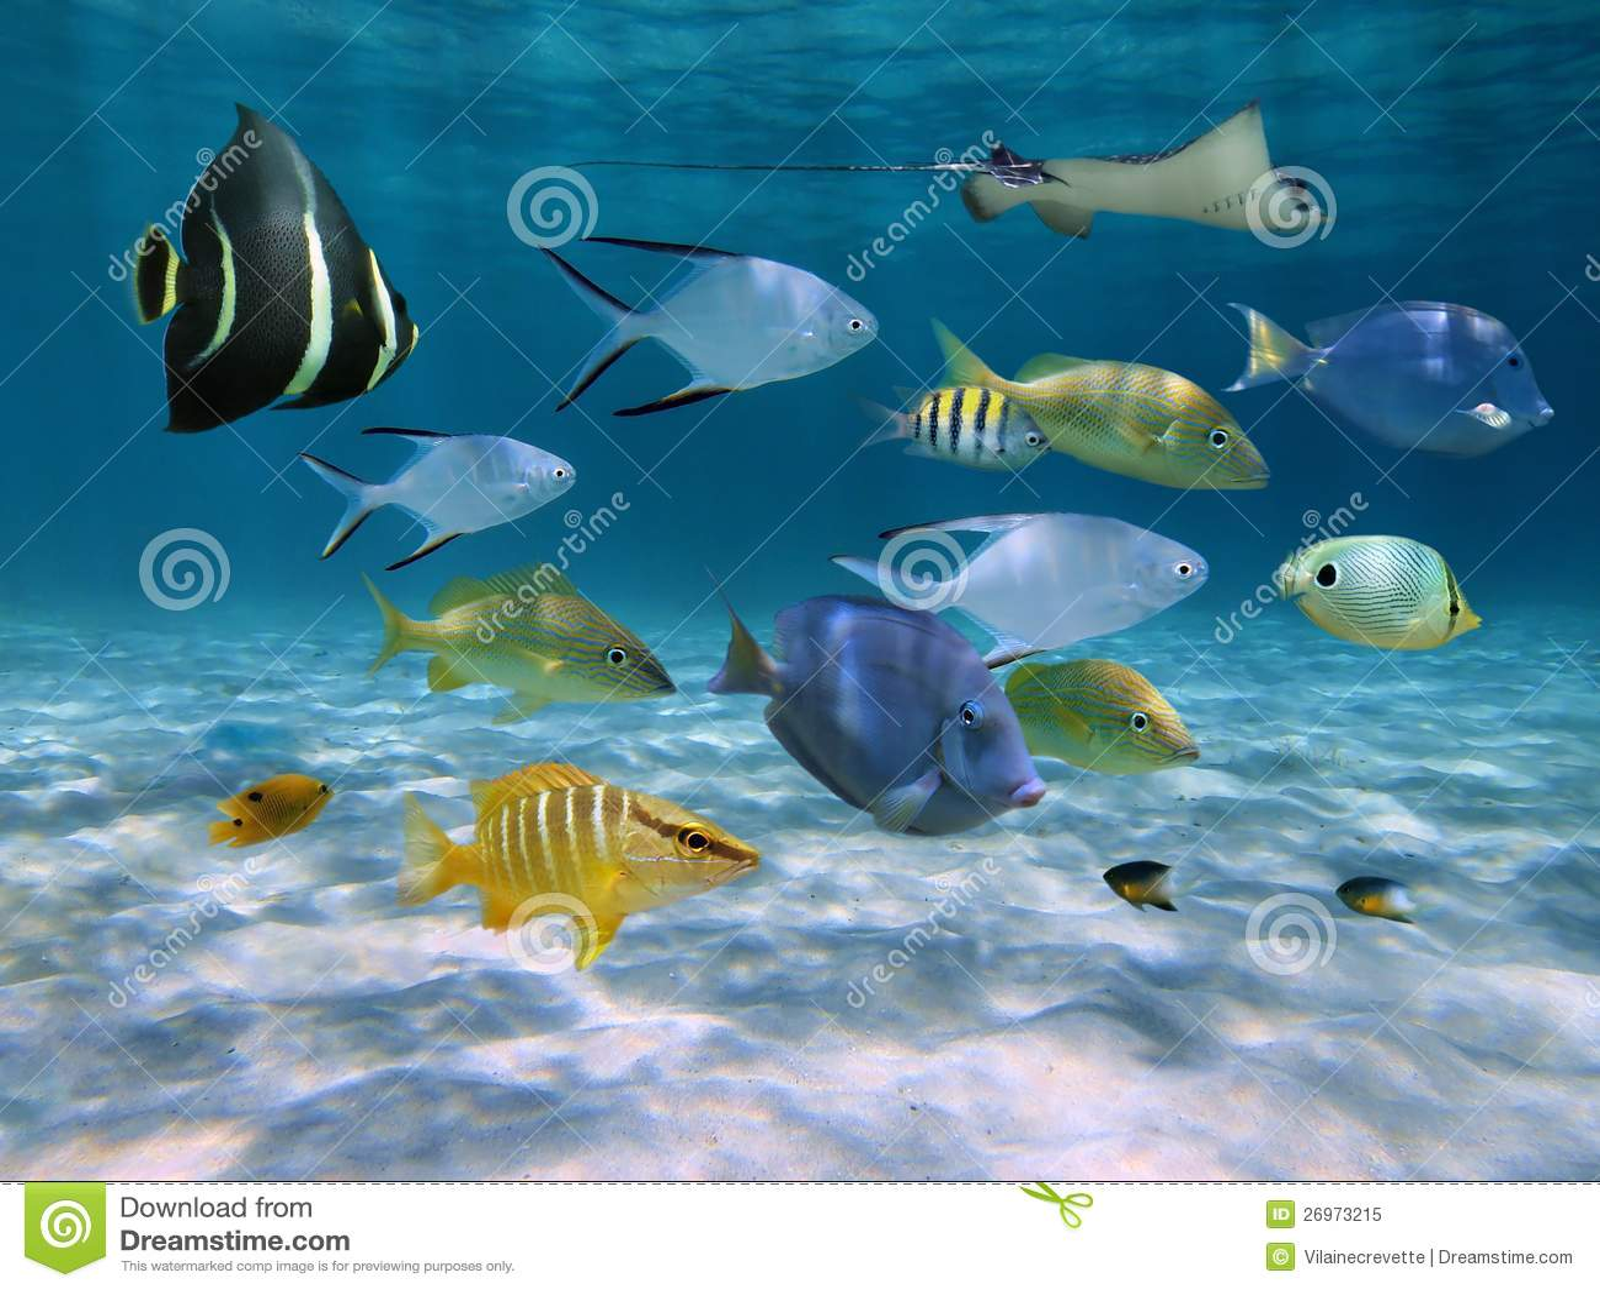 School Of Fish Over A Sandy Ocean Floor Royalty Free Stock Photo